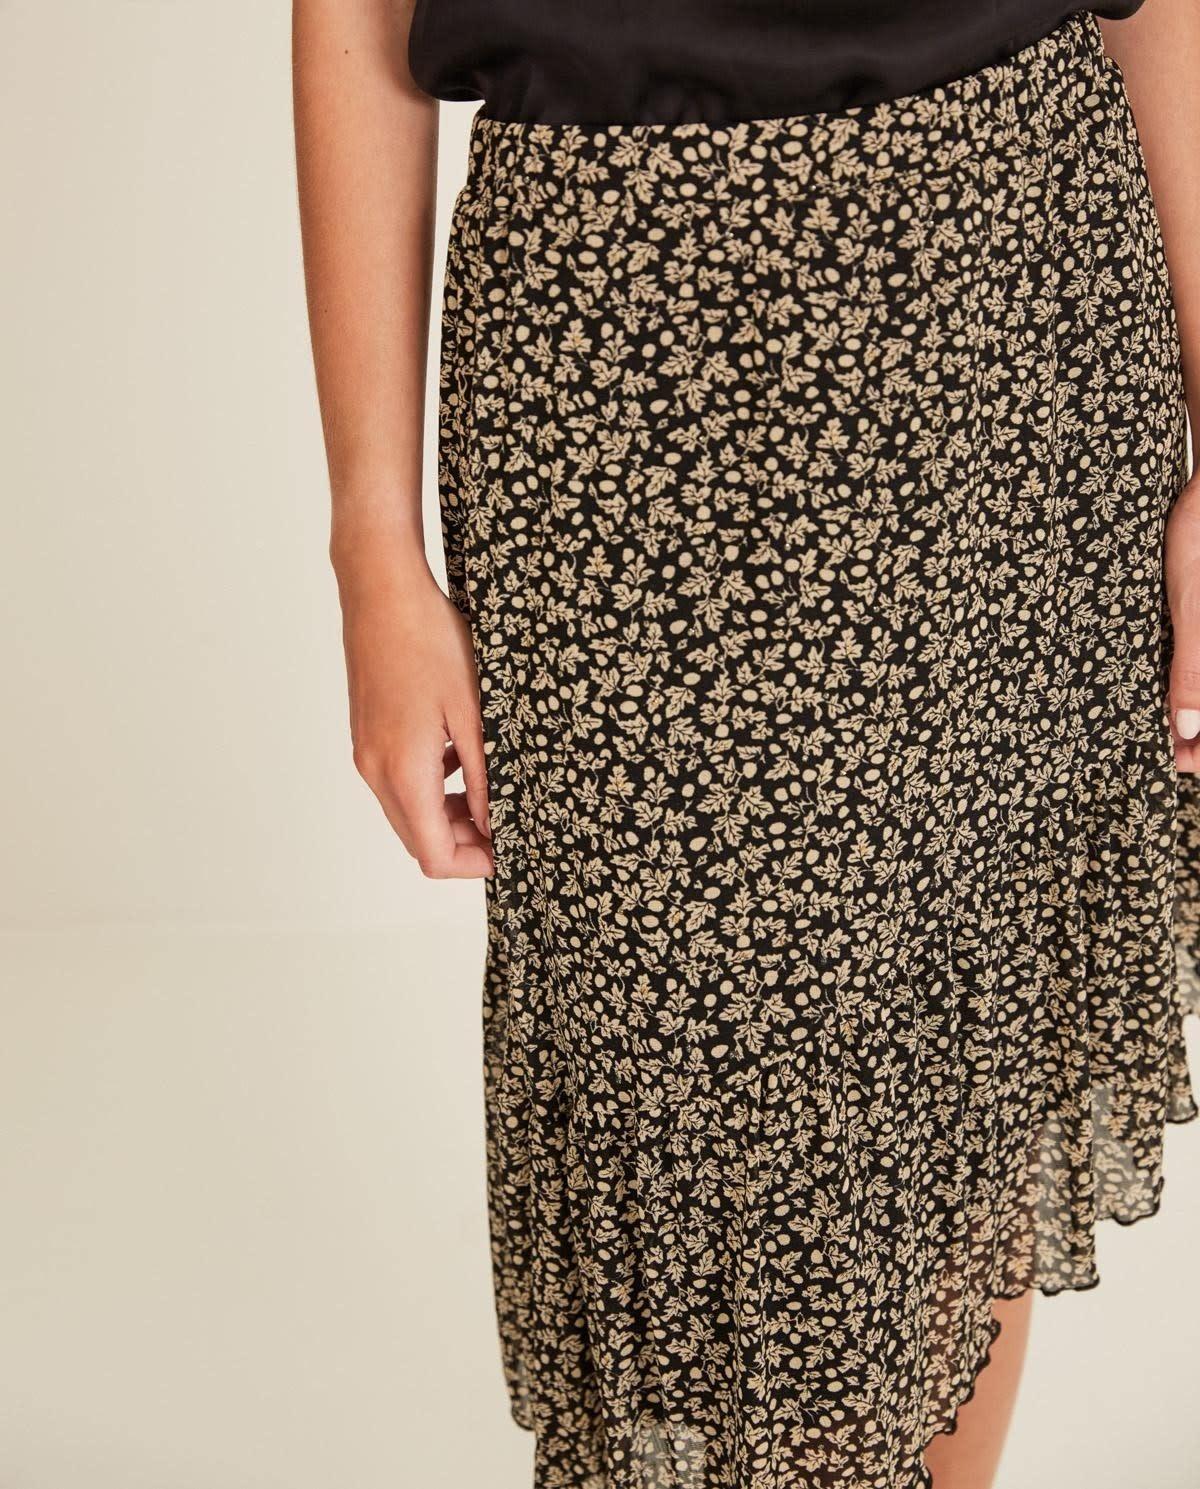 Yerse Leah33 - Skirt